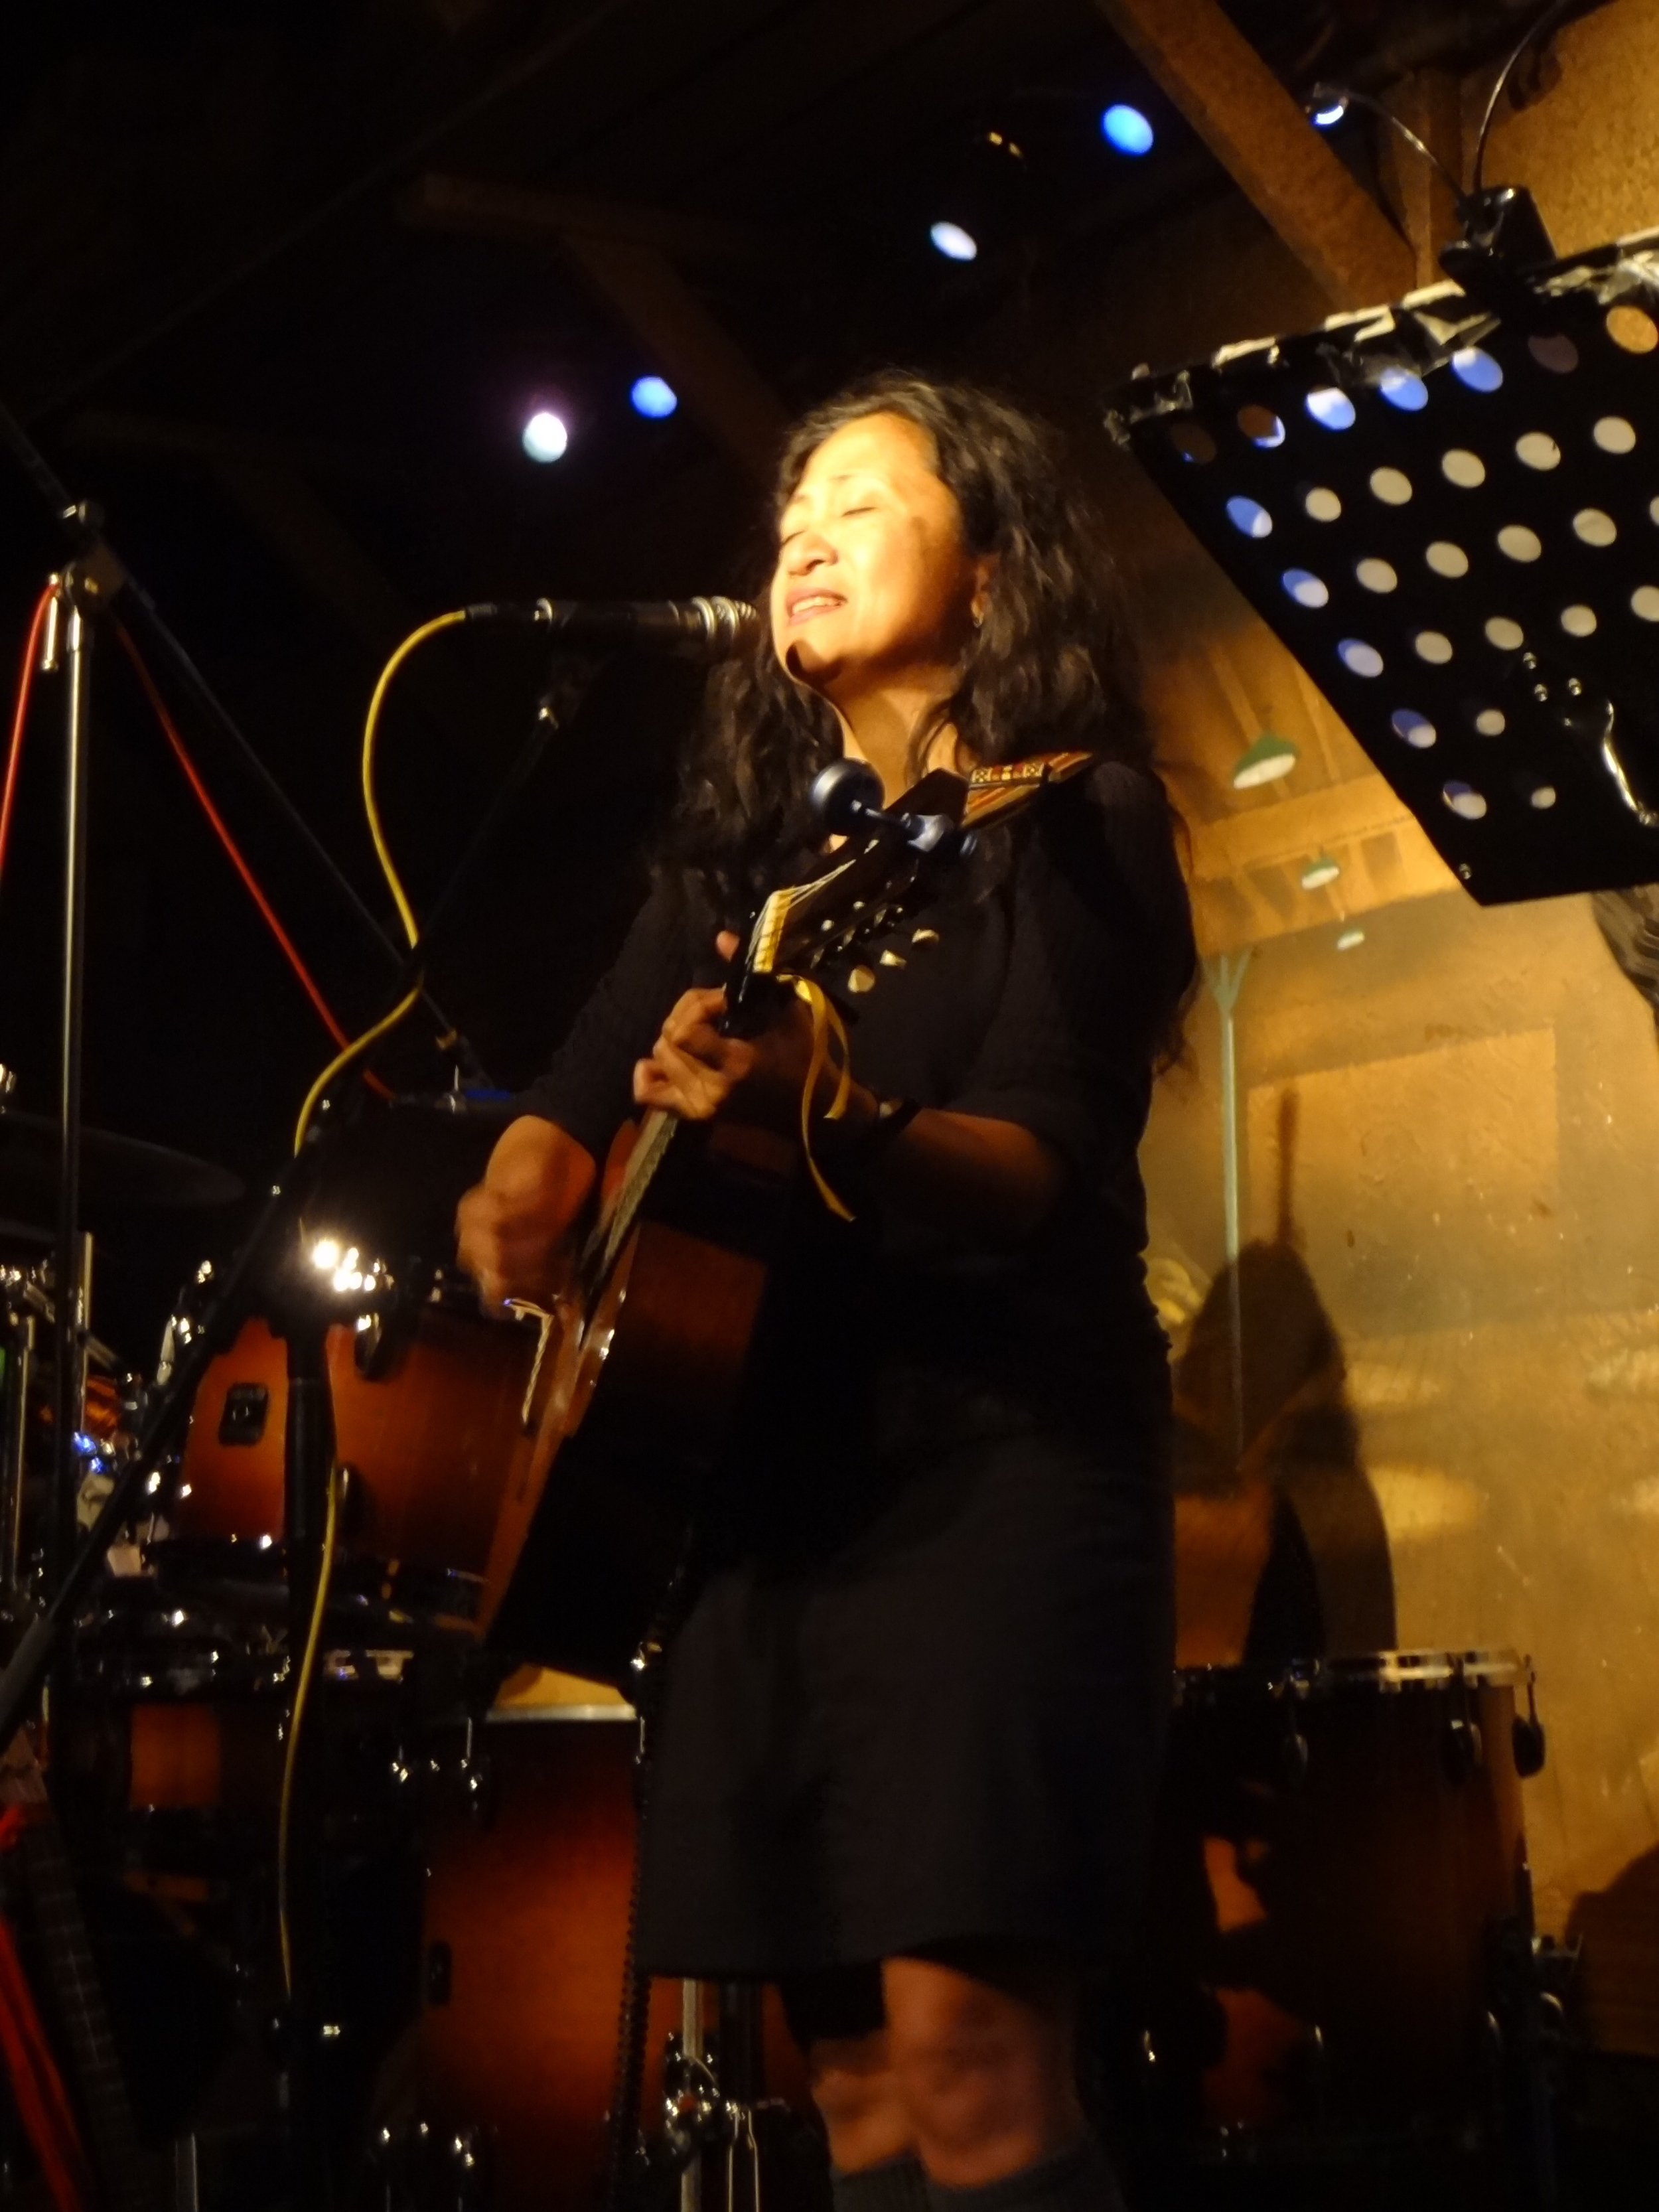 Aireene Espiritu  at the Coffee Gallery Backstage. photo by Cynthia Brando